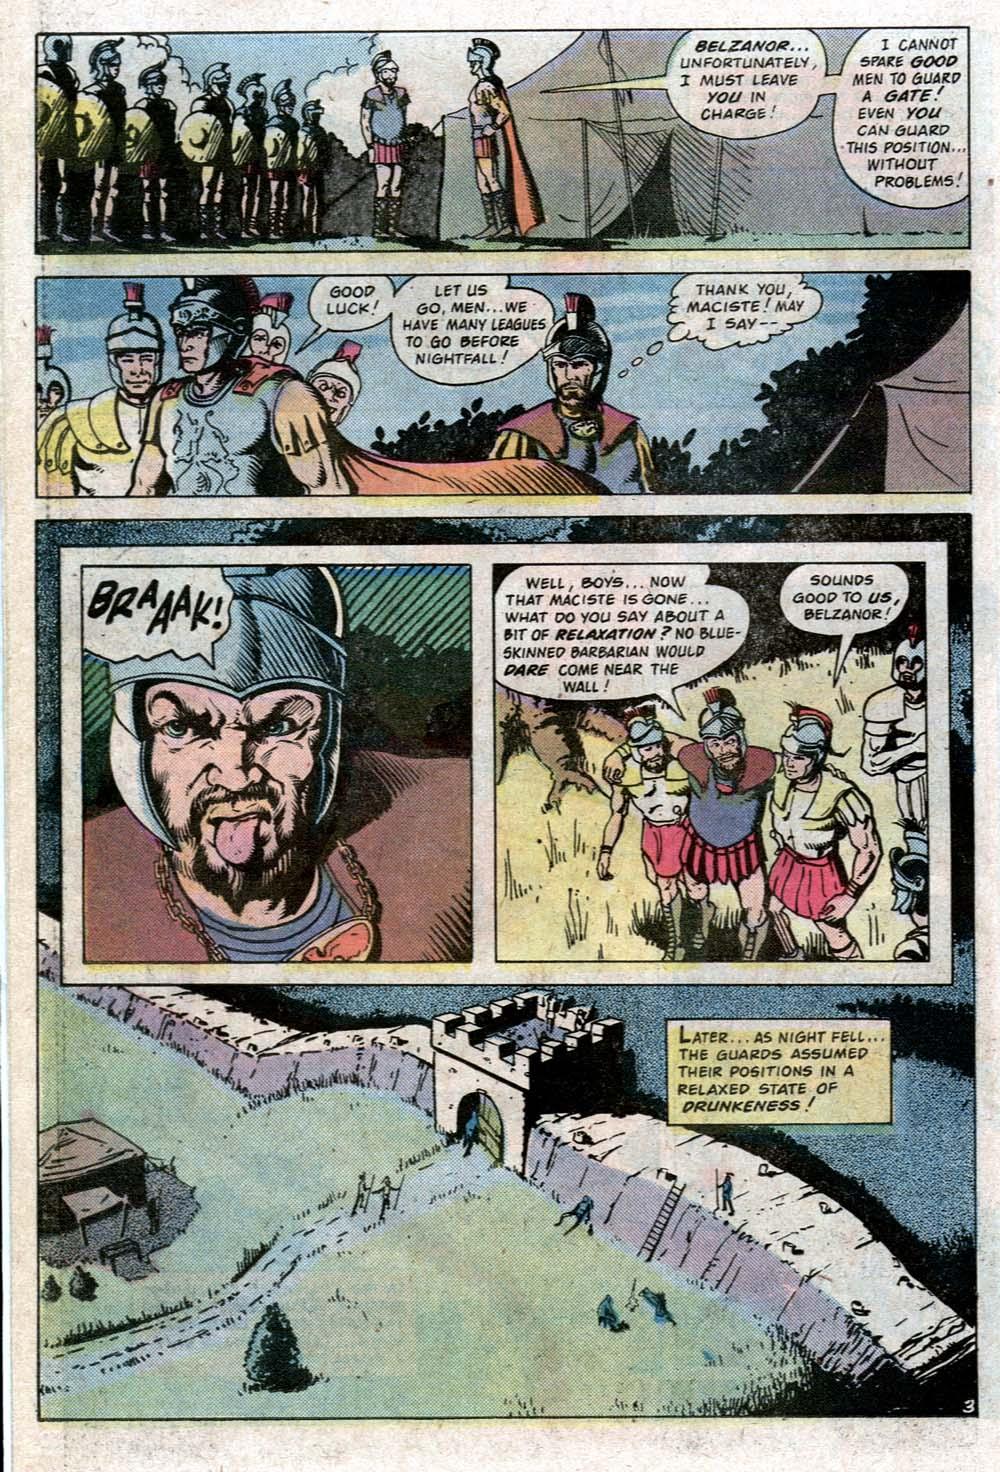 Read online Sgt. Rock comic -  Issue #352 - 22